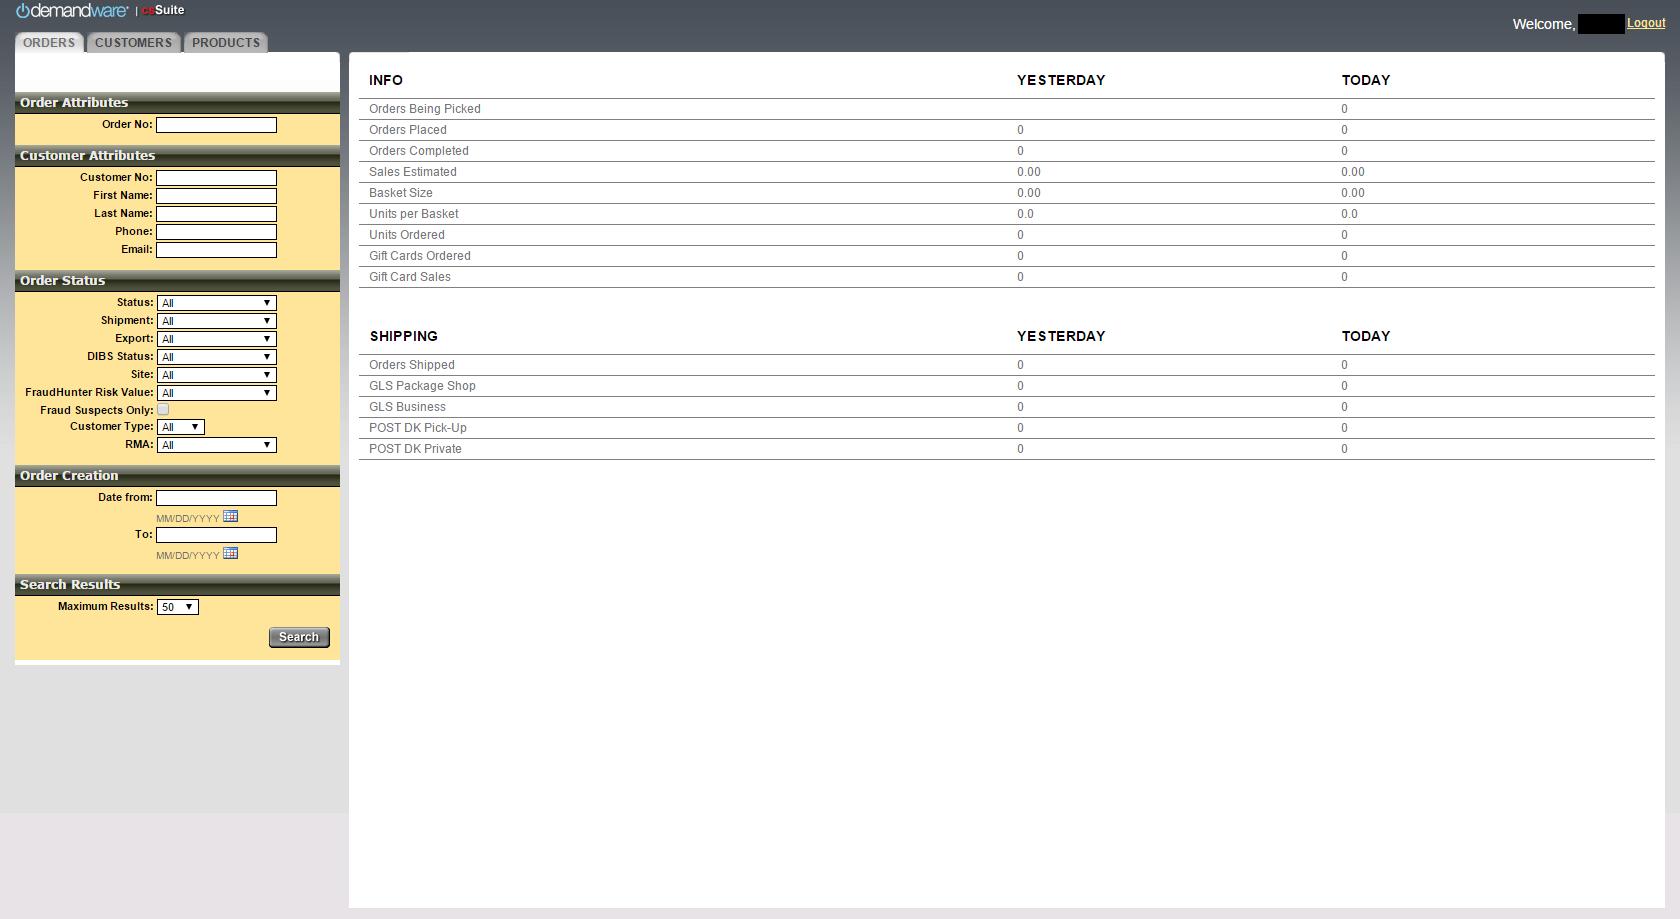 Demandware Customer Service Suite